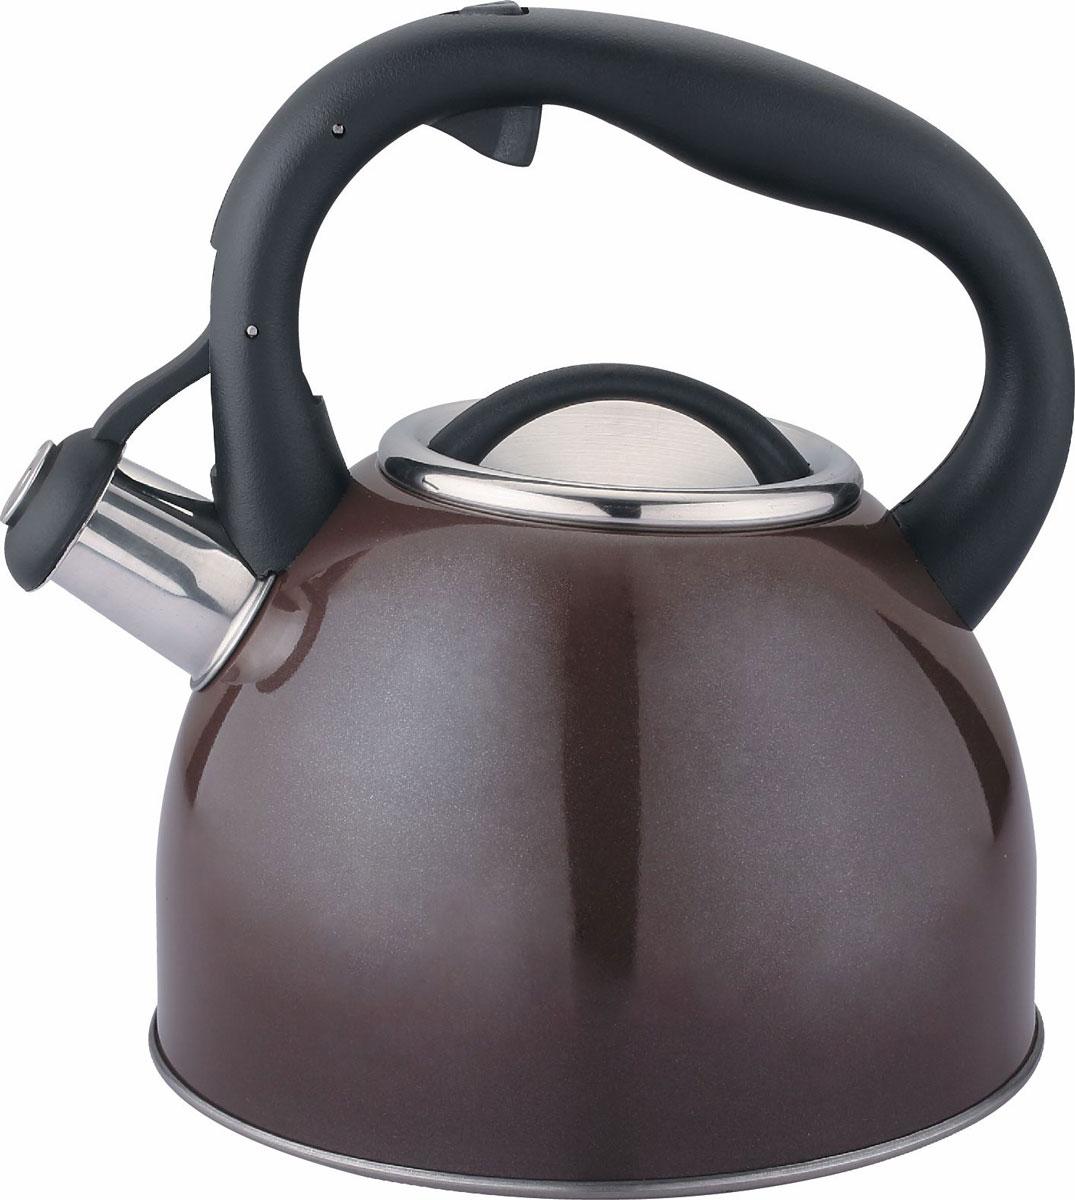 Чайник Cs-Kochsysteme Bonn, со свистком, цвет: коричневый, 2,5 л чайник cs kochsysteme bonn со свистком цвет медь 2 5 л